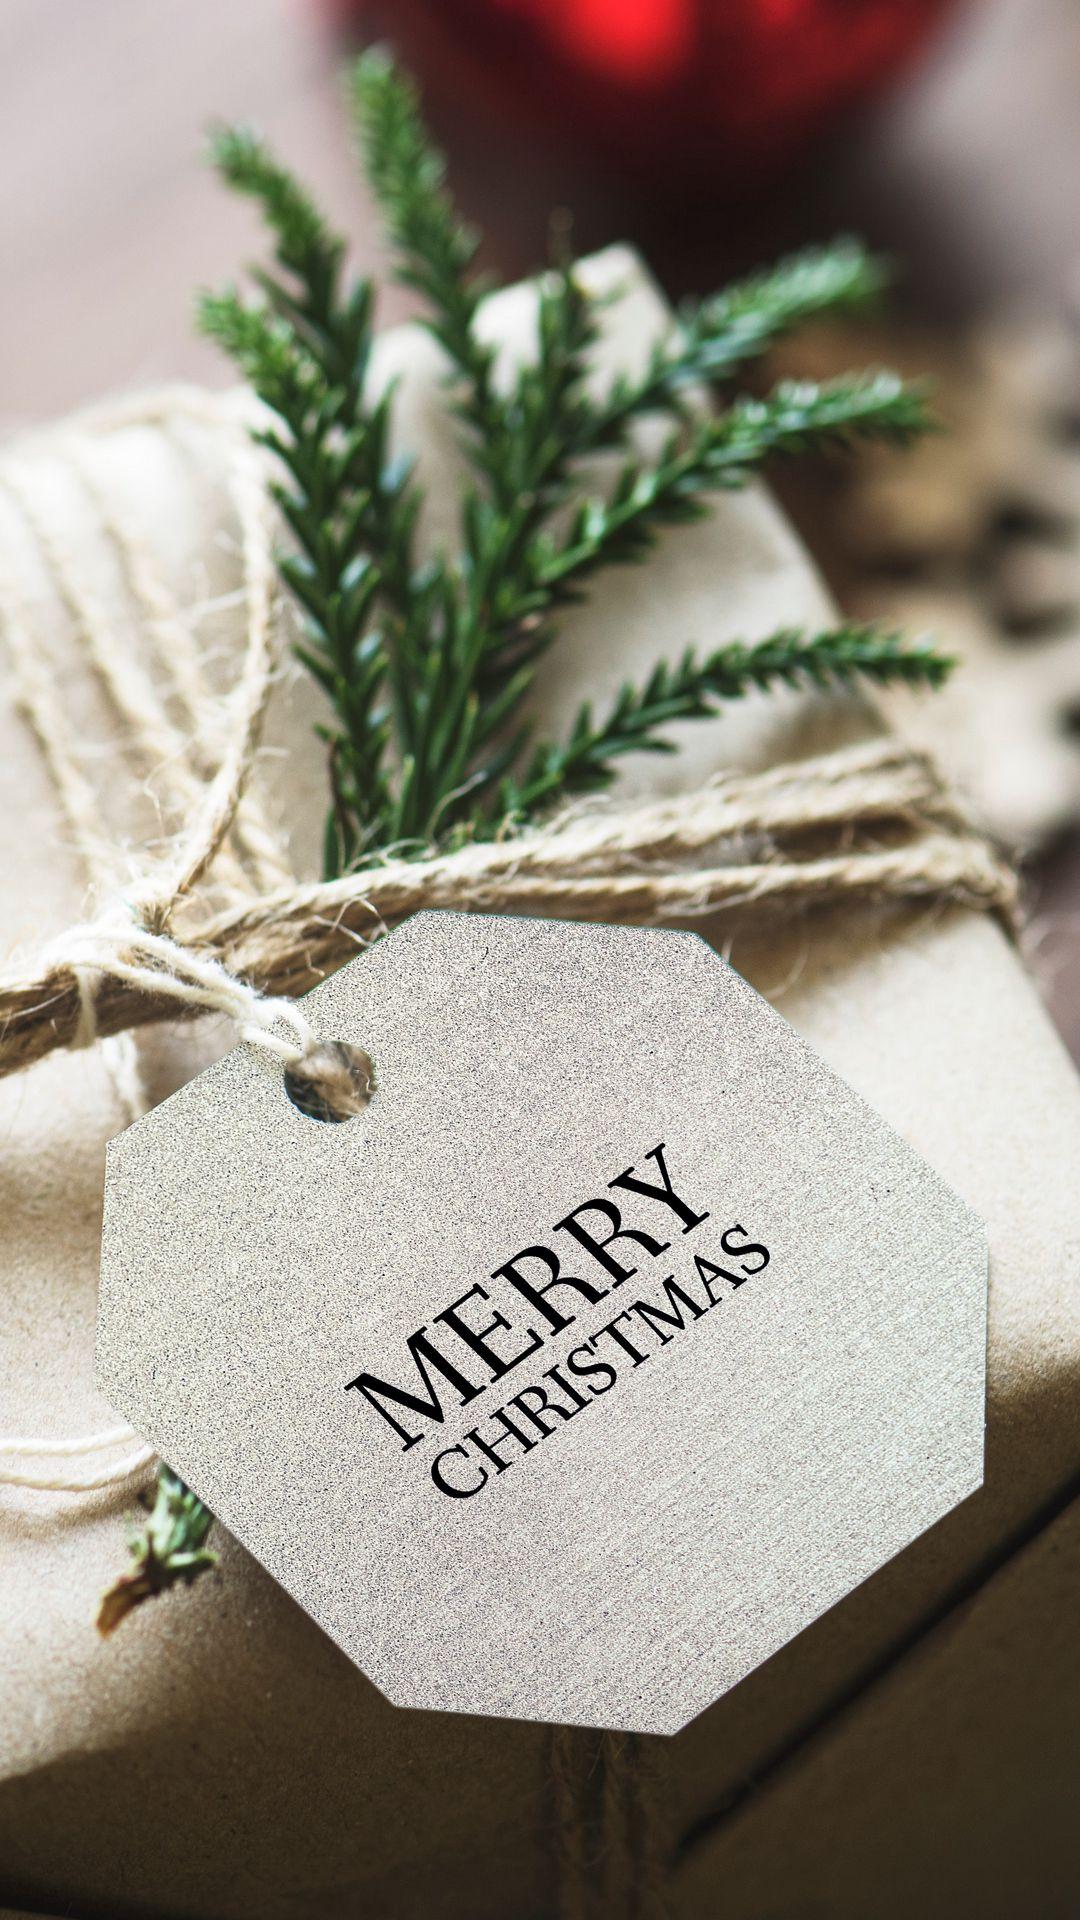 1080x1920 Wallpaper gift, christmas, new year, tag, box